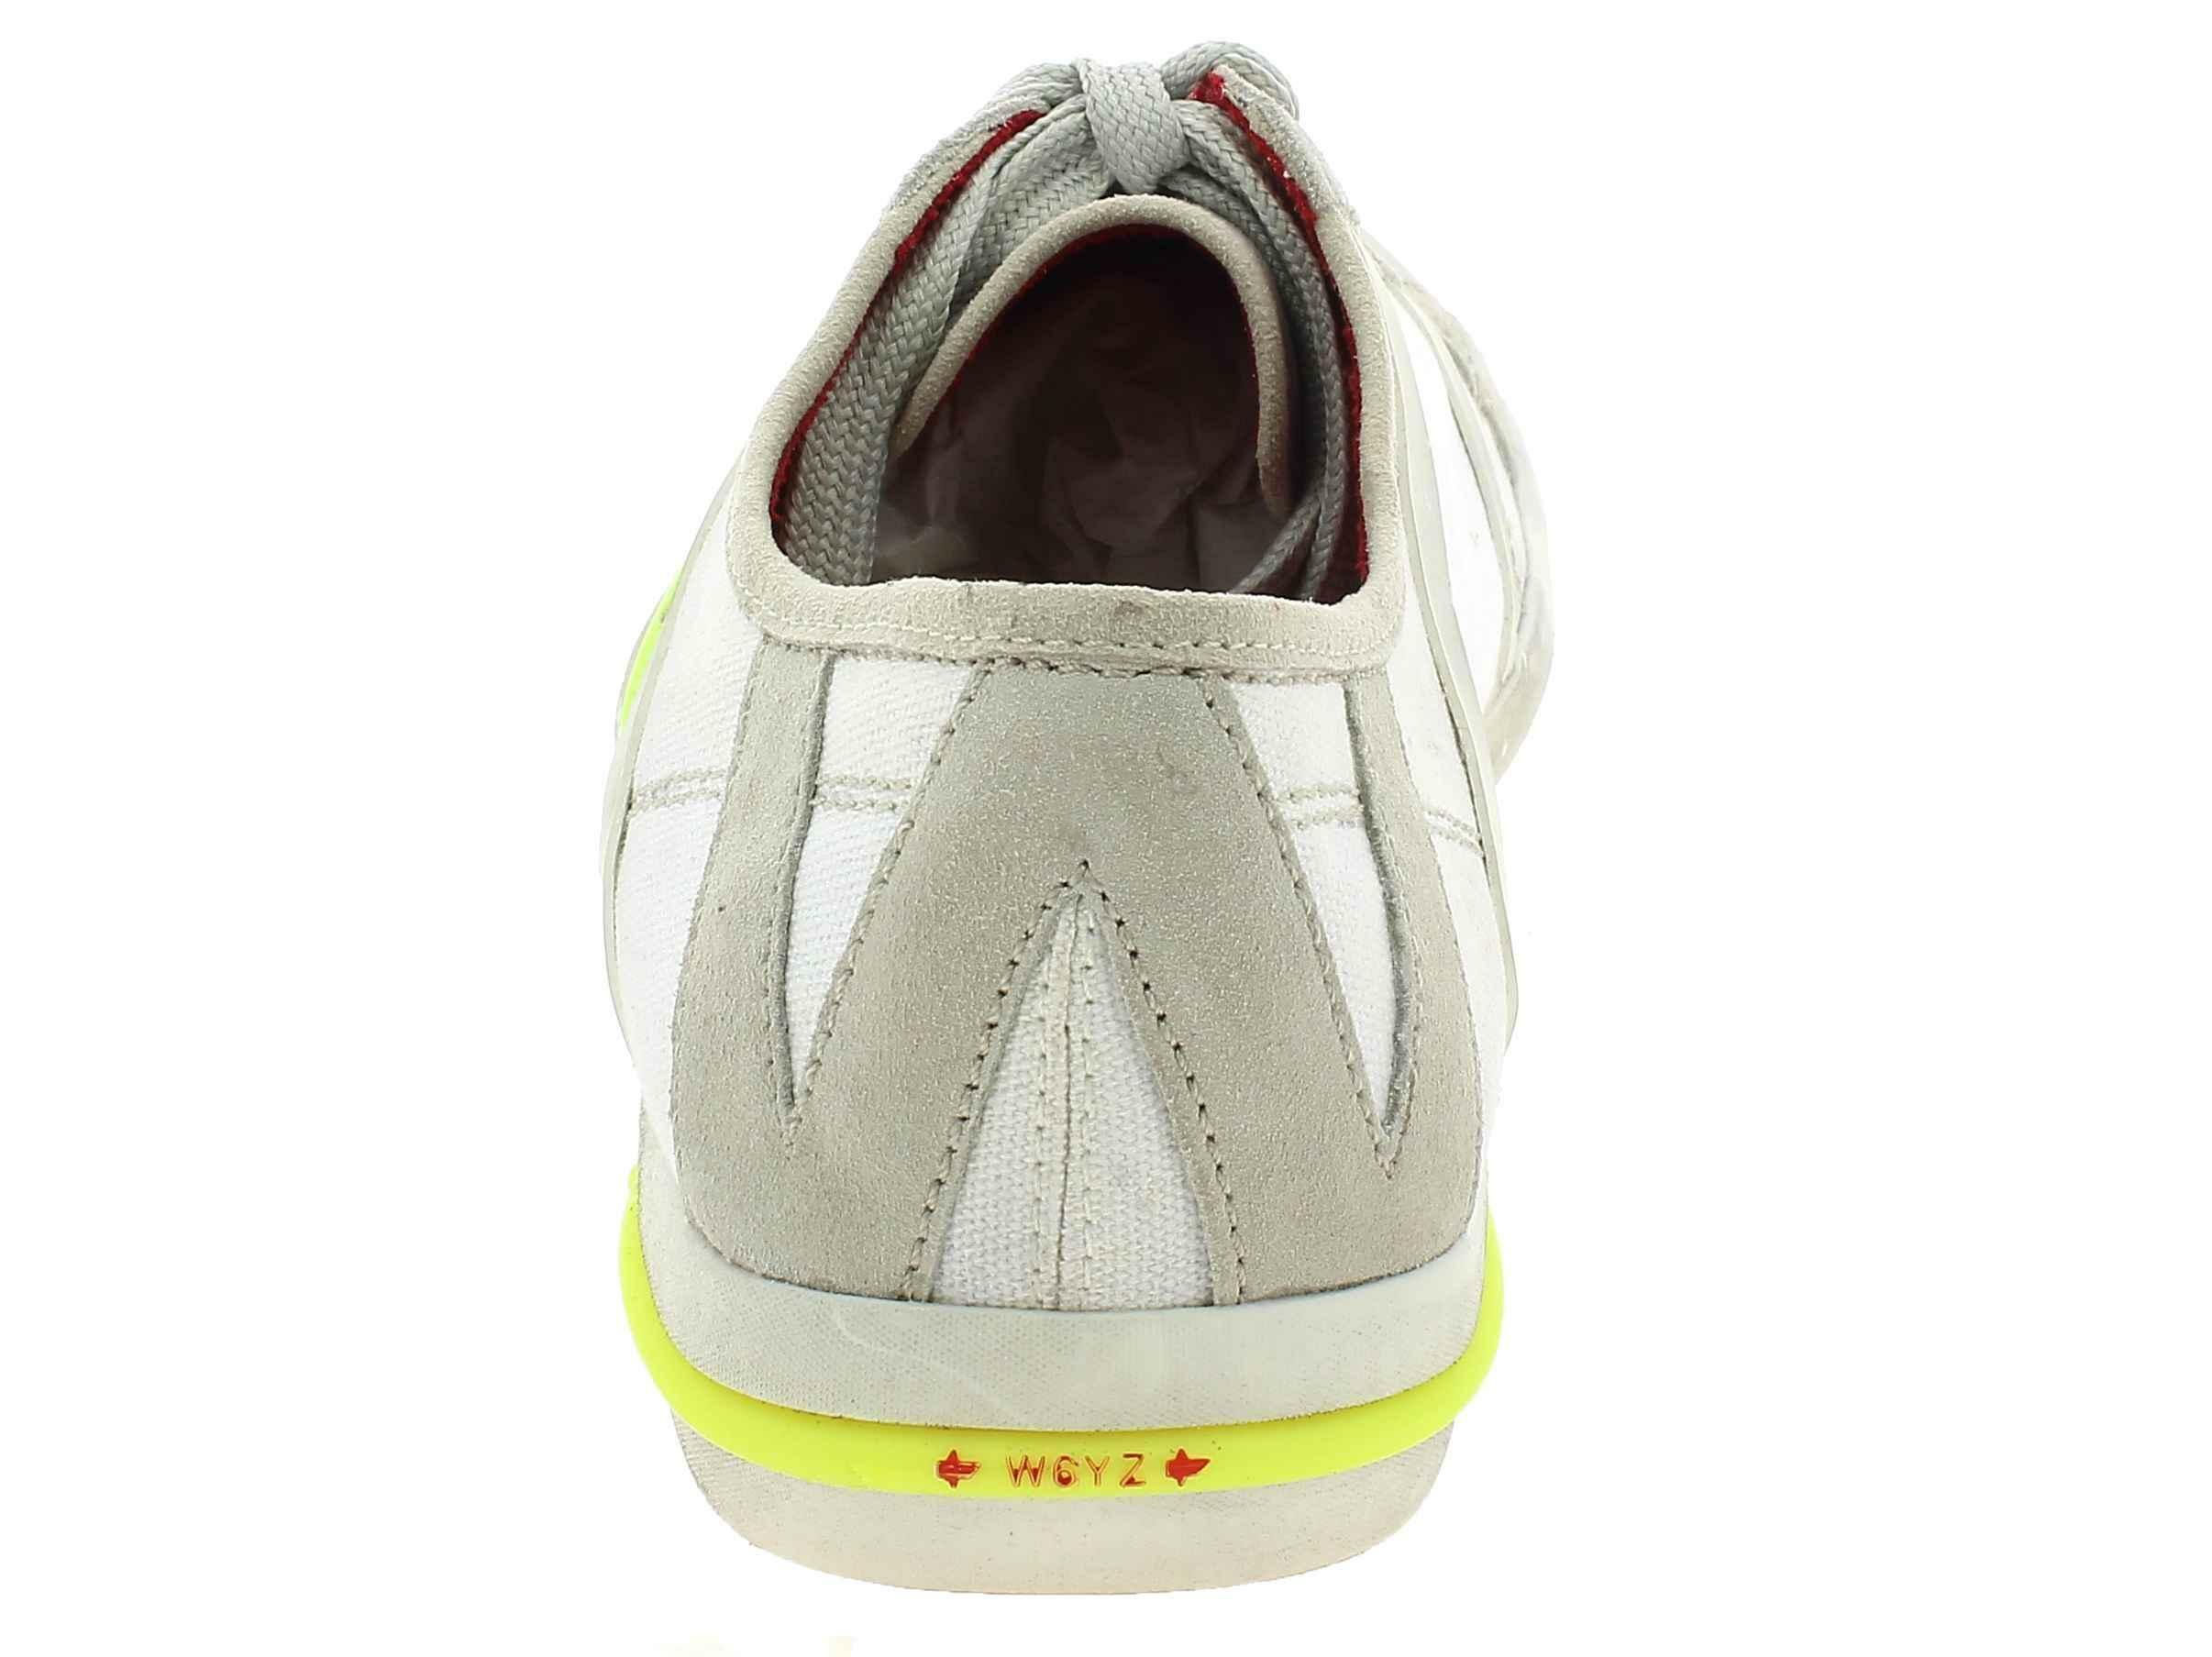 w6yz w6yz scarpe sportive uomo in pelle bianche skater laces